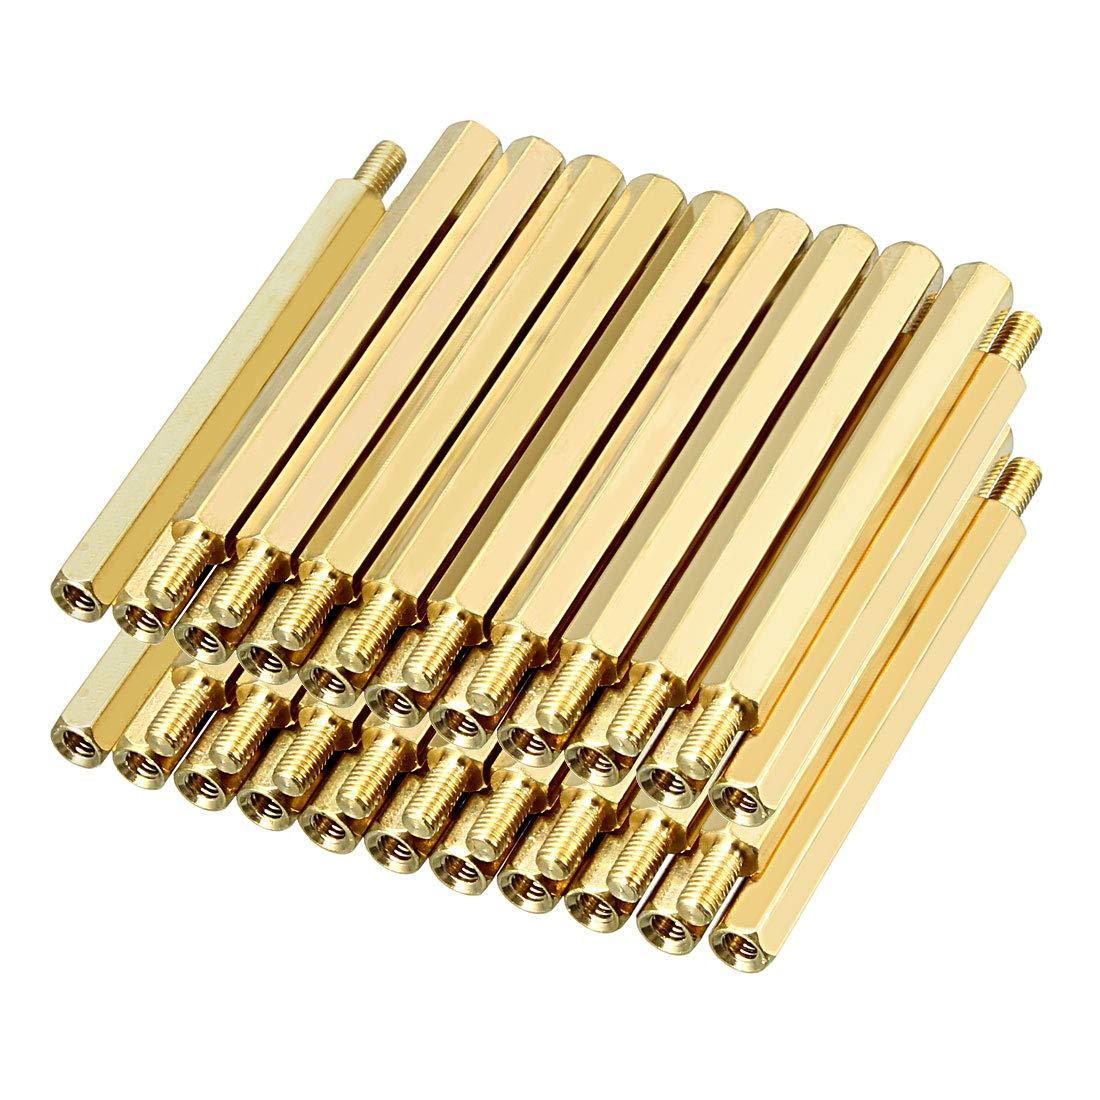 uxcell 40pcs M3 60 6mm Female Male Thread Brass Hex Standoff Spacer Screws PCB Pillar